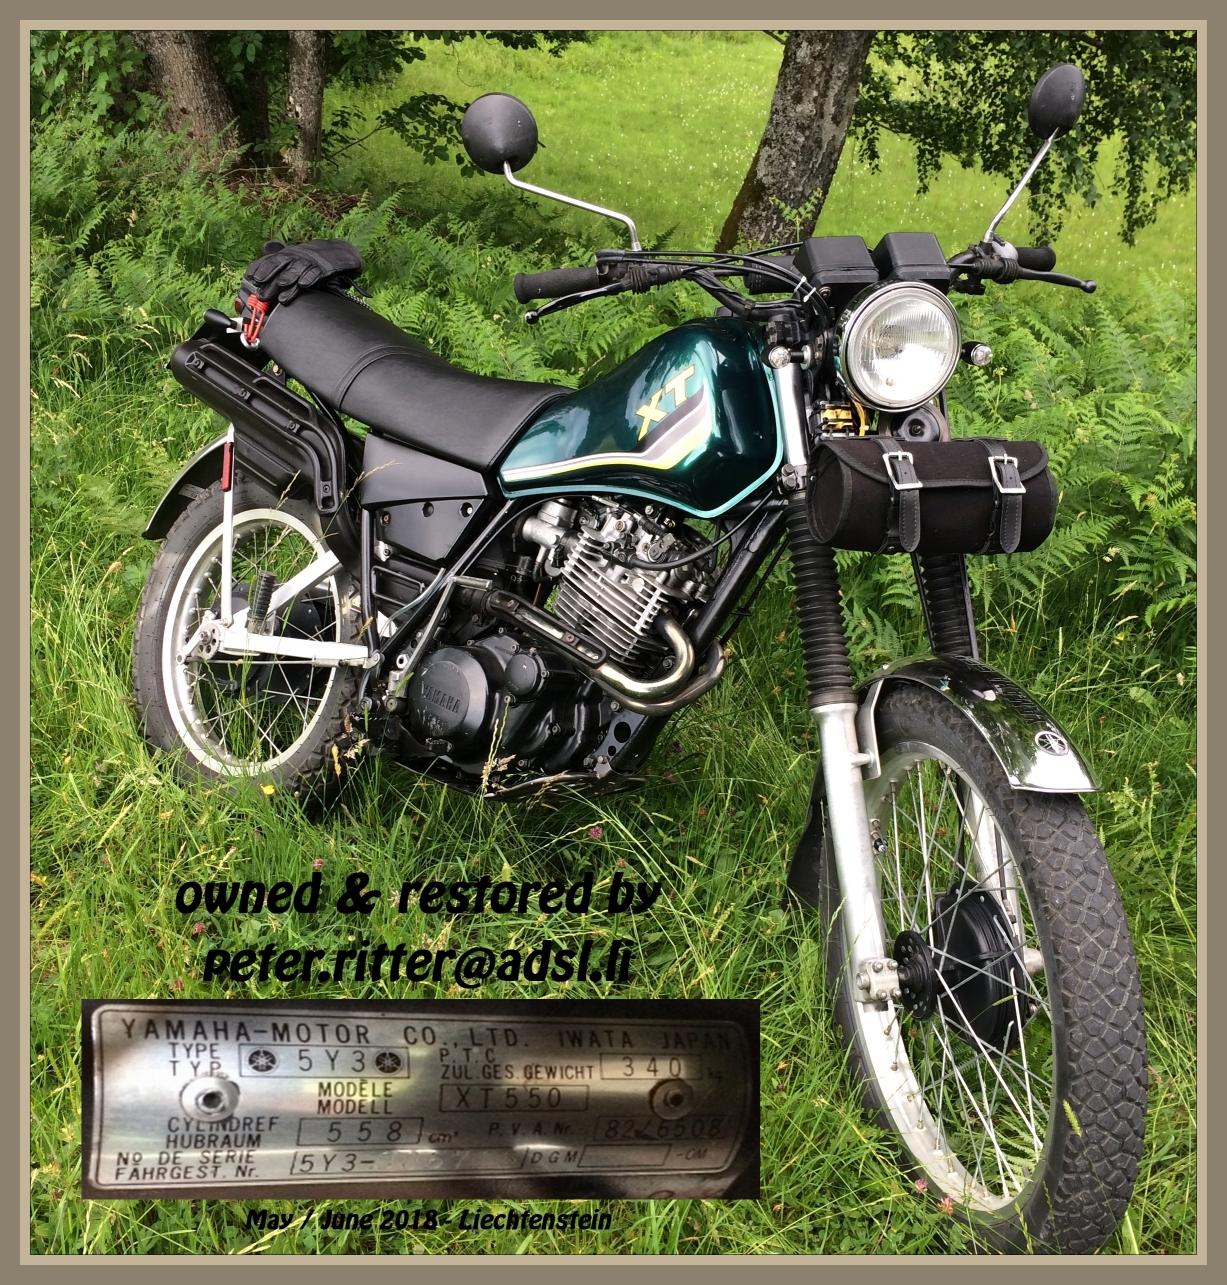 xt550-5y3-1982-in-liechtenstein-897d308d9da4b6431643616e0ffbf406ae019fe2